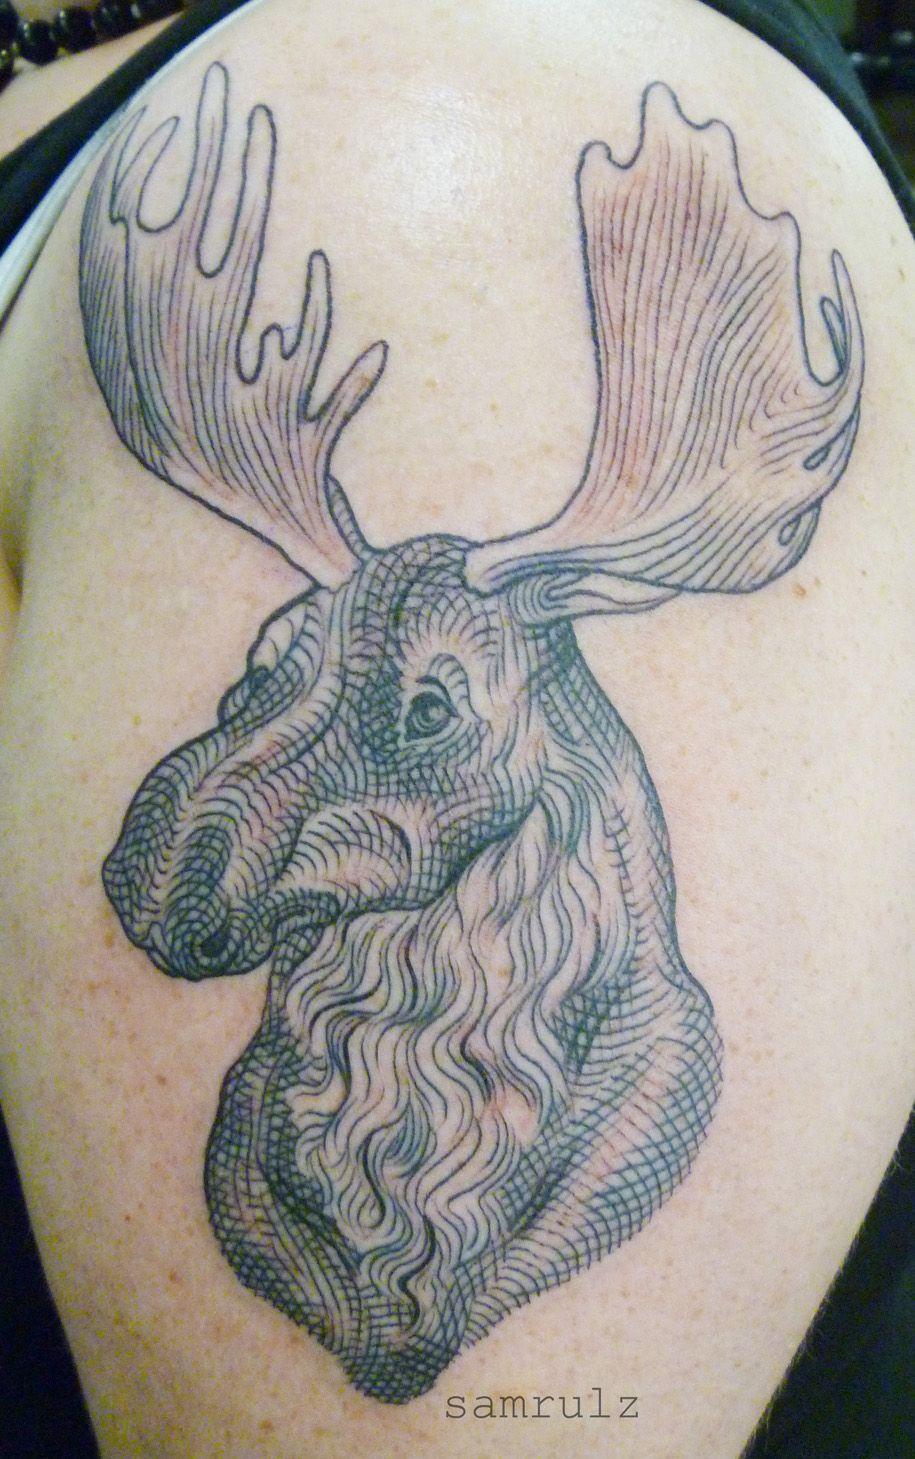 illustrated moose tattoo tattoo art pinterest moose tattoo and inspiring tattoos. Black Bedroom Furniture Sets. Home Design Ideas